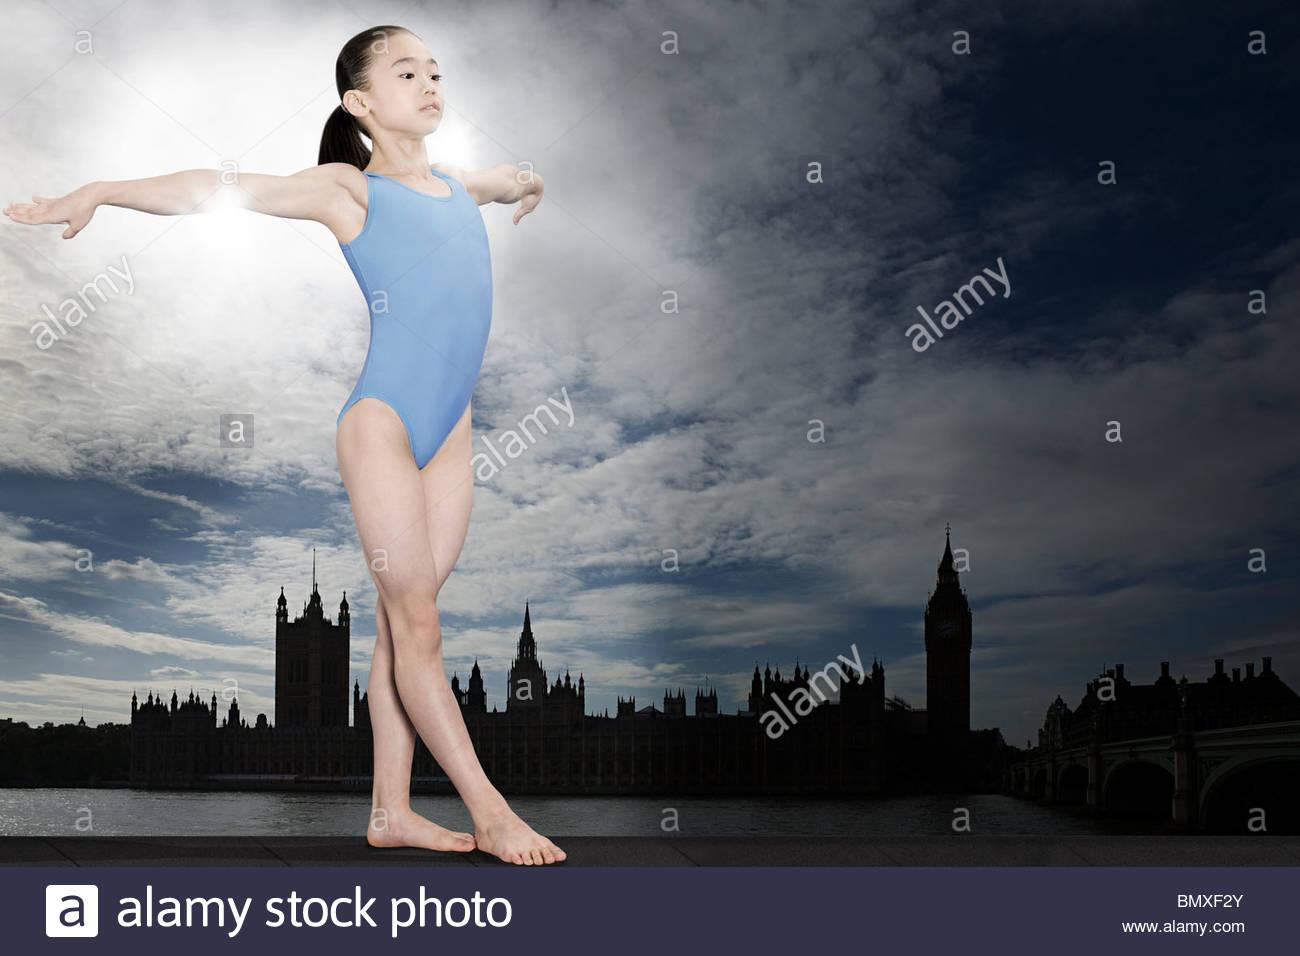 Girl gymnast in westminster - Stock Image